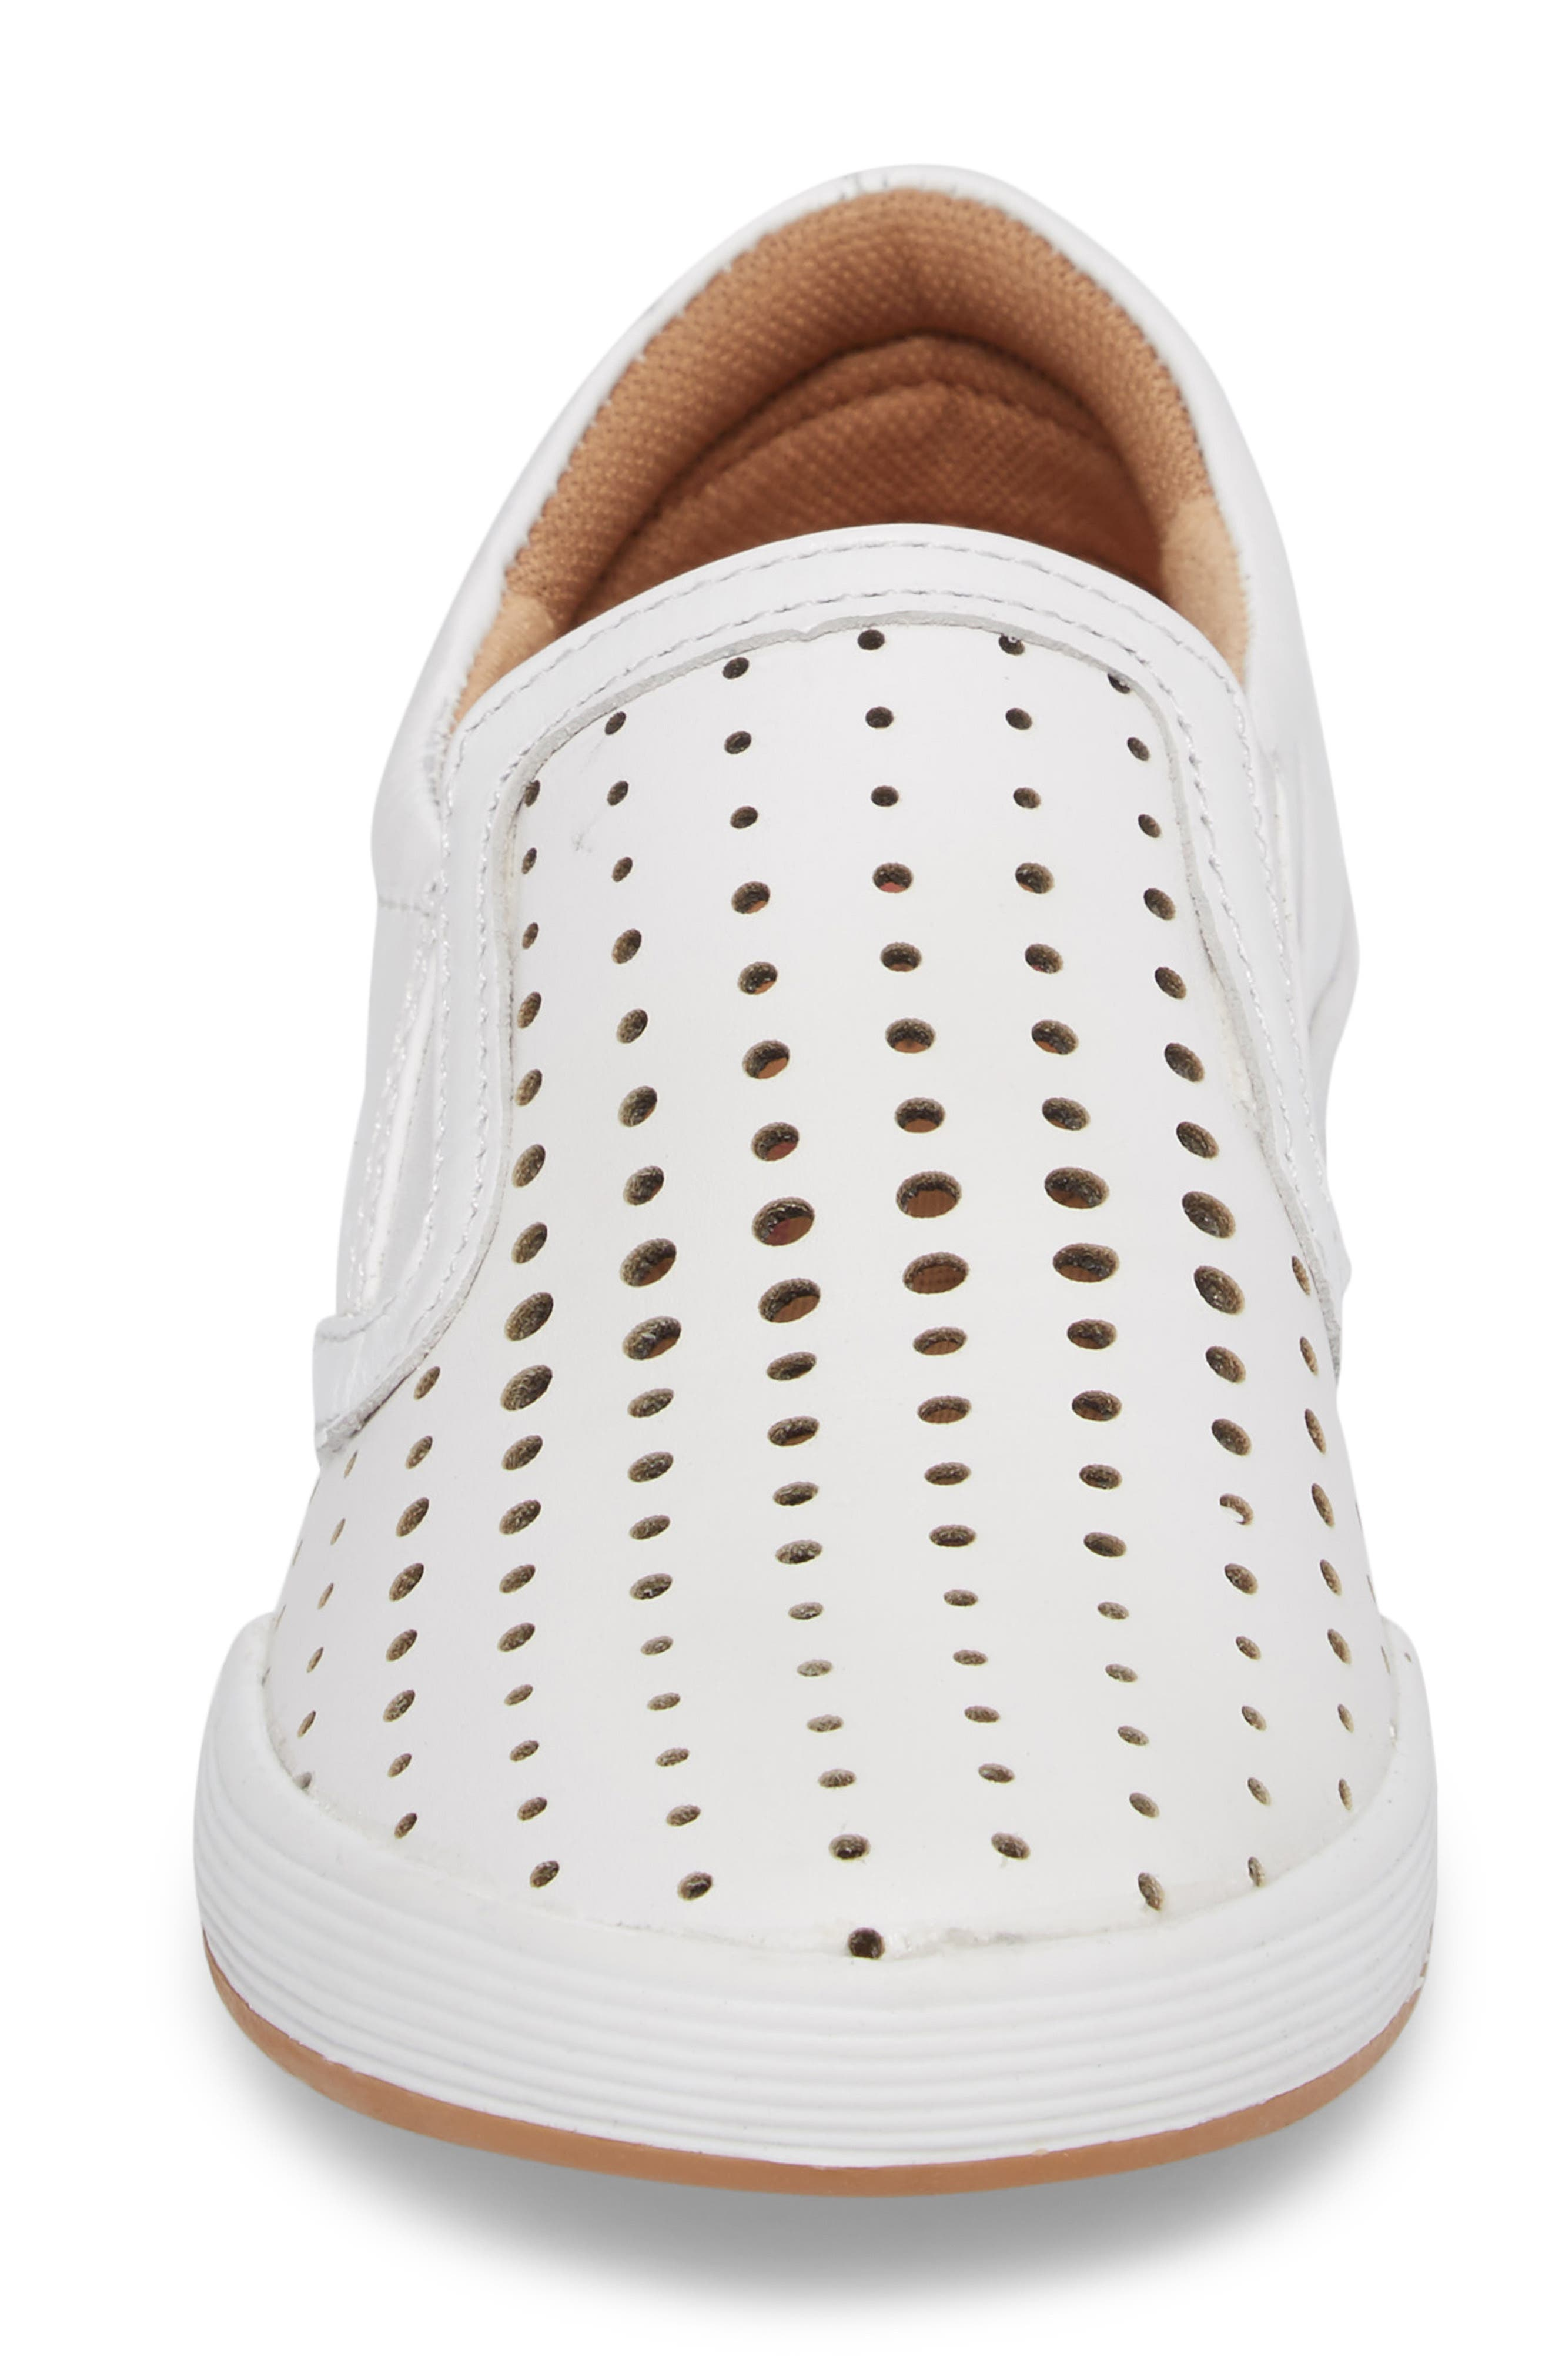 Lyra Perforated Slip-On Sneaker,                             Alternate thumbnail 4, color,                             White Leather